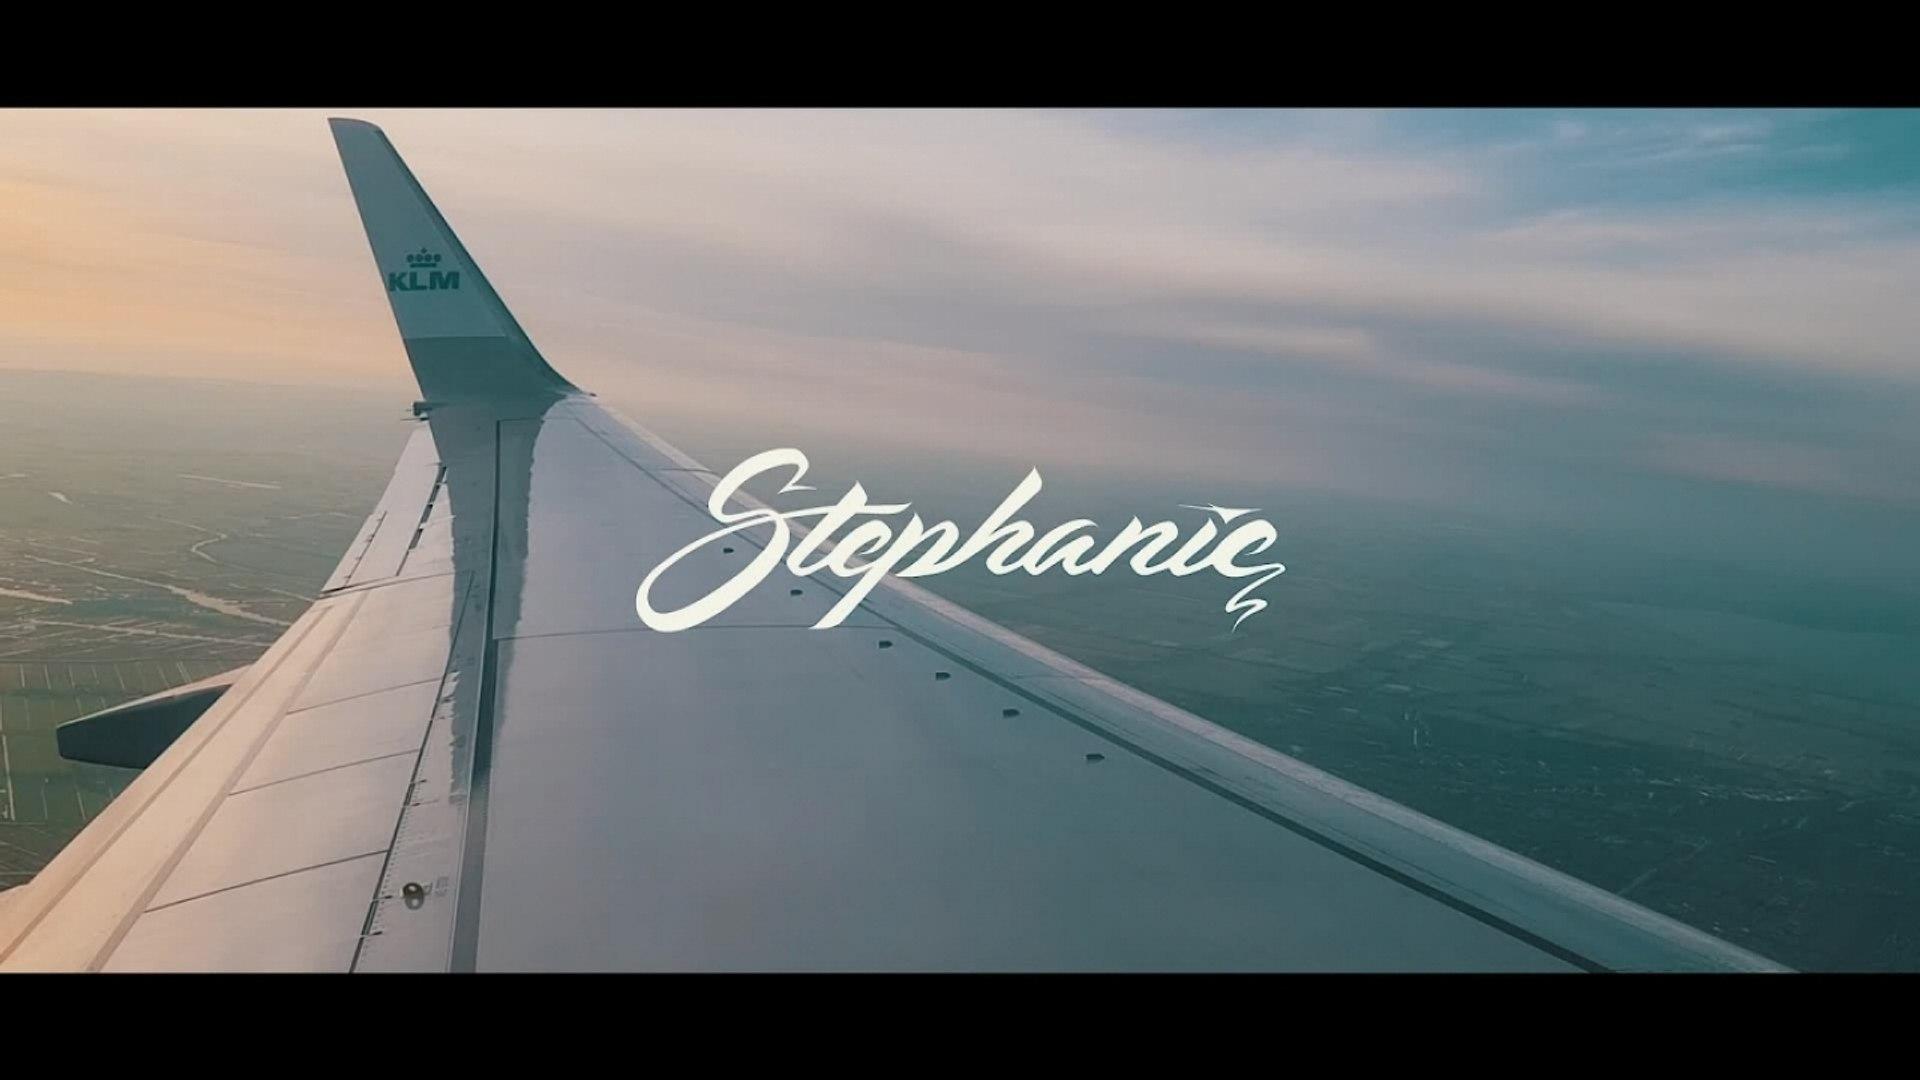 Stephanie - I'm an Artist Warrior - Defqon 1 2017 Experience -